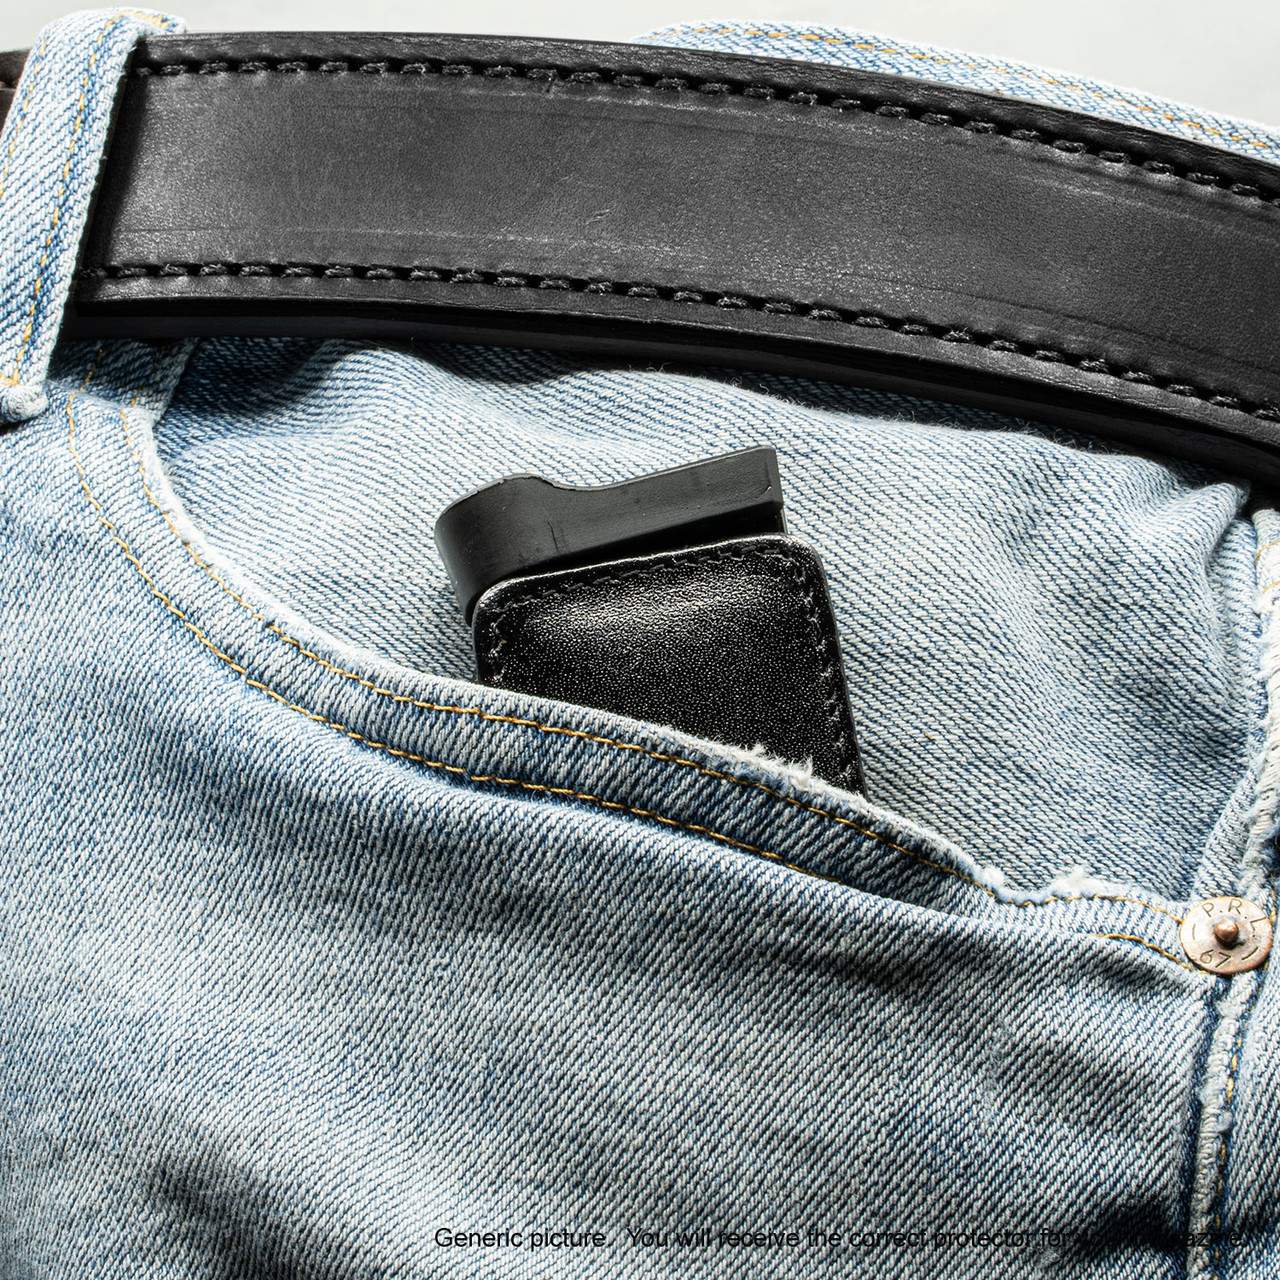 Beretta 84fs Cheetah Black Leather Magazine Pocket Protector